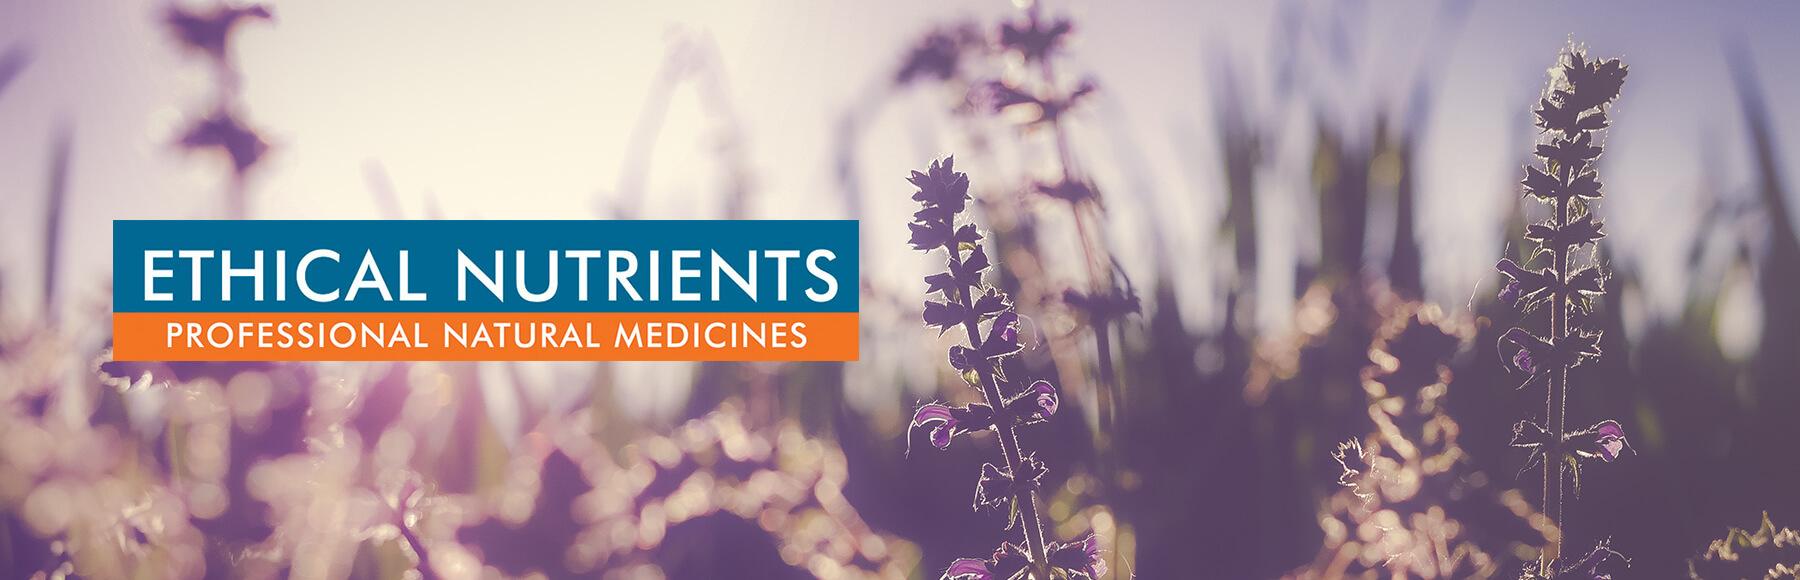 ethical-nutrients-banner.jpg